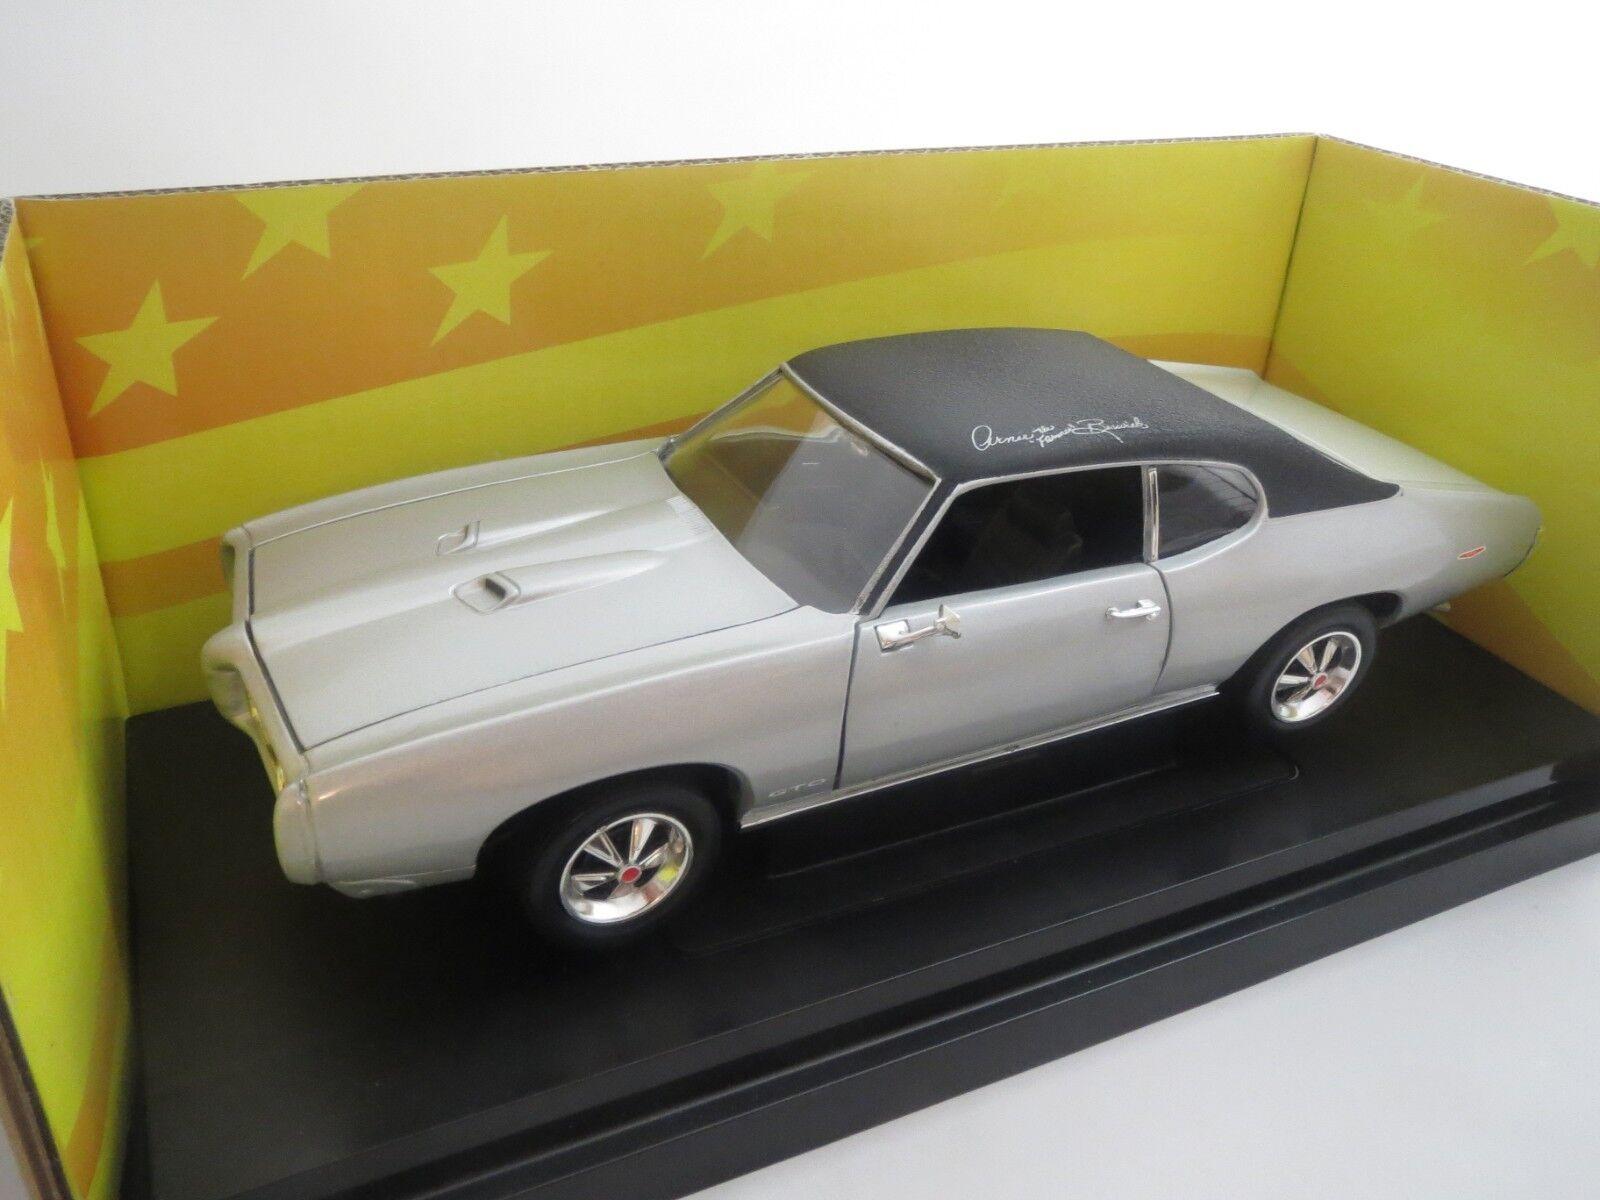 oferta especial Ertl American muscle 1969 Pontiac GTO  Arnie the the the Farmer Beswick  1 18 original   online barato